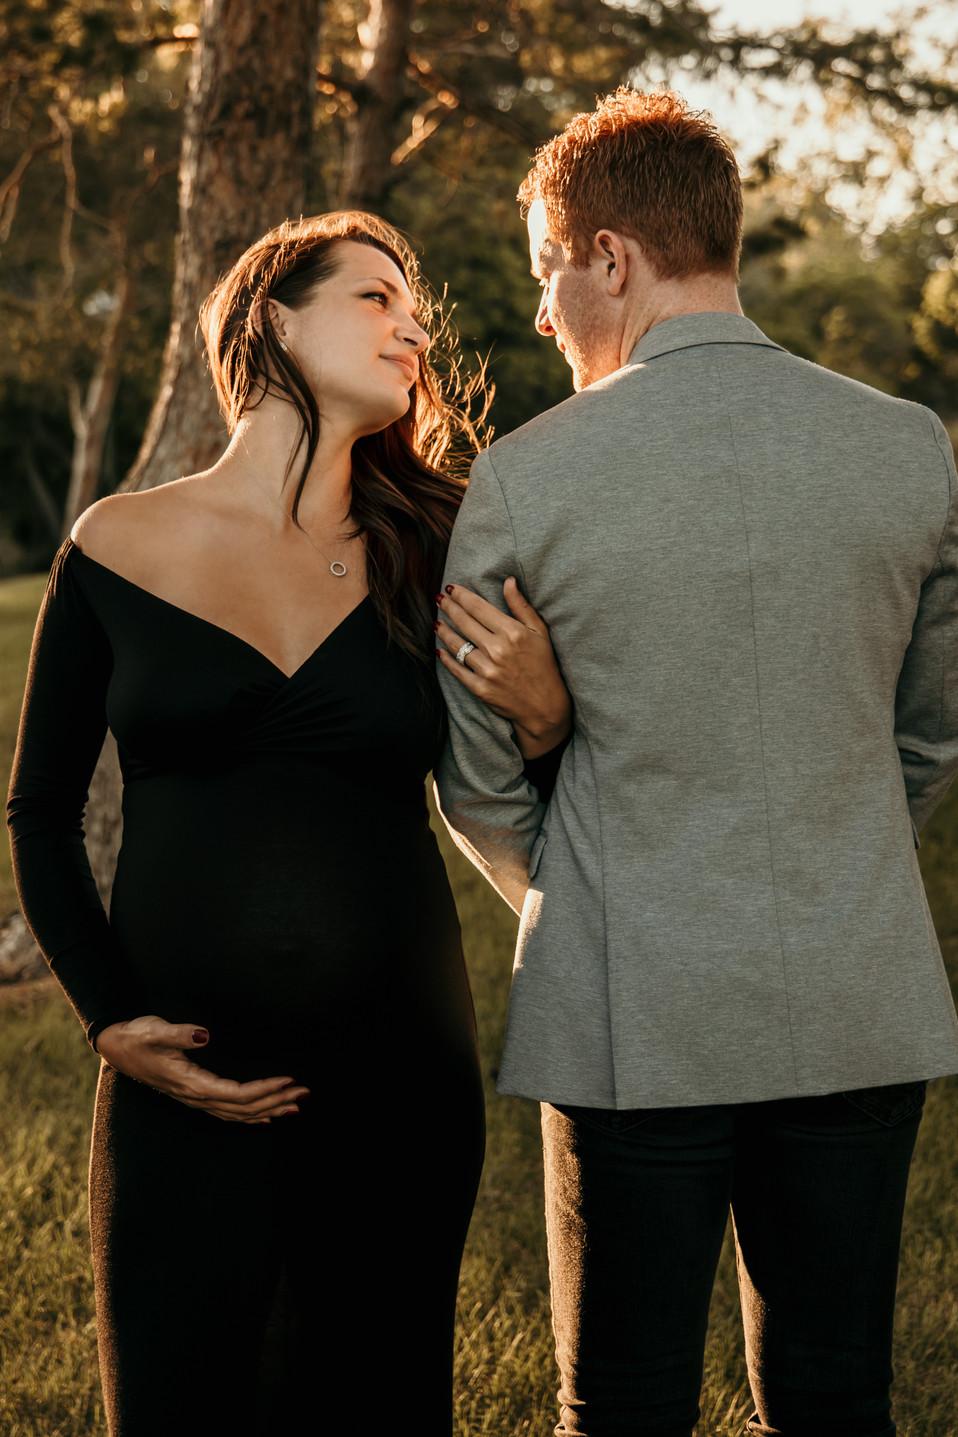 balgonie photographer, regina photographer, maternity photographer, maternity photos, saskatchewan photographer